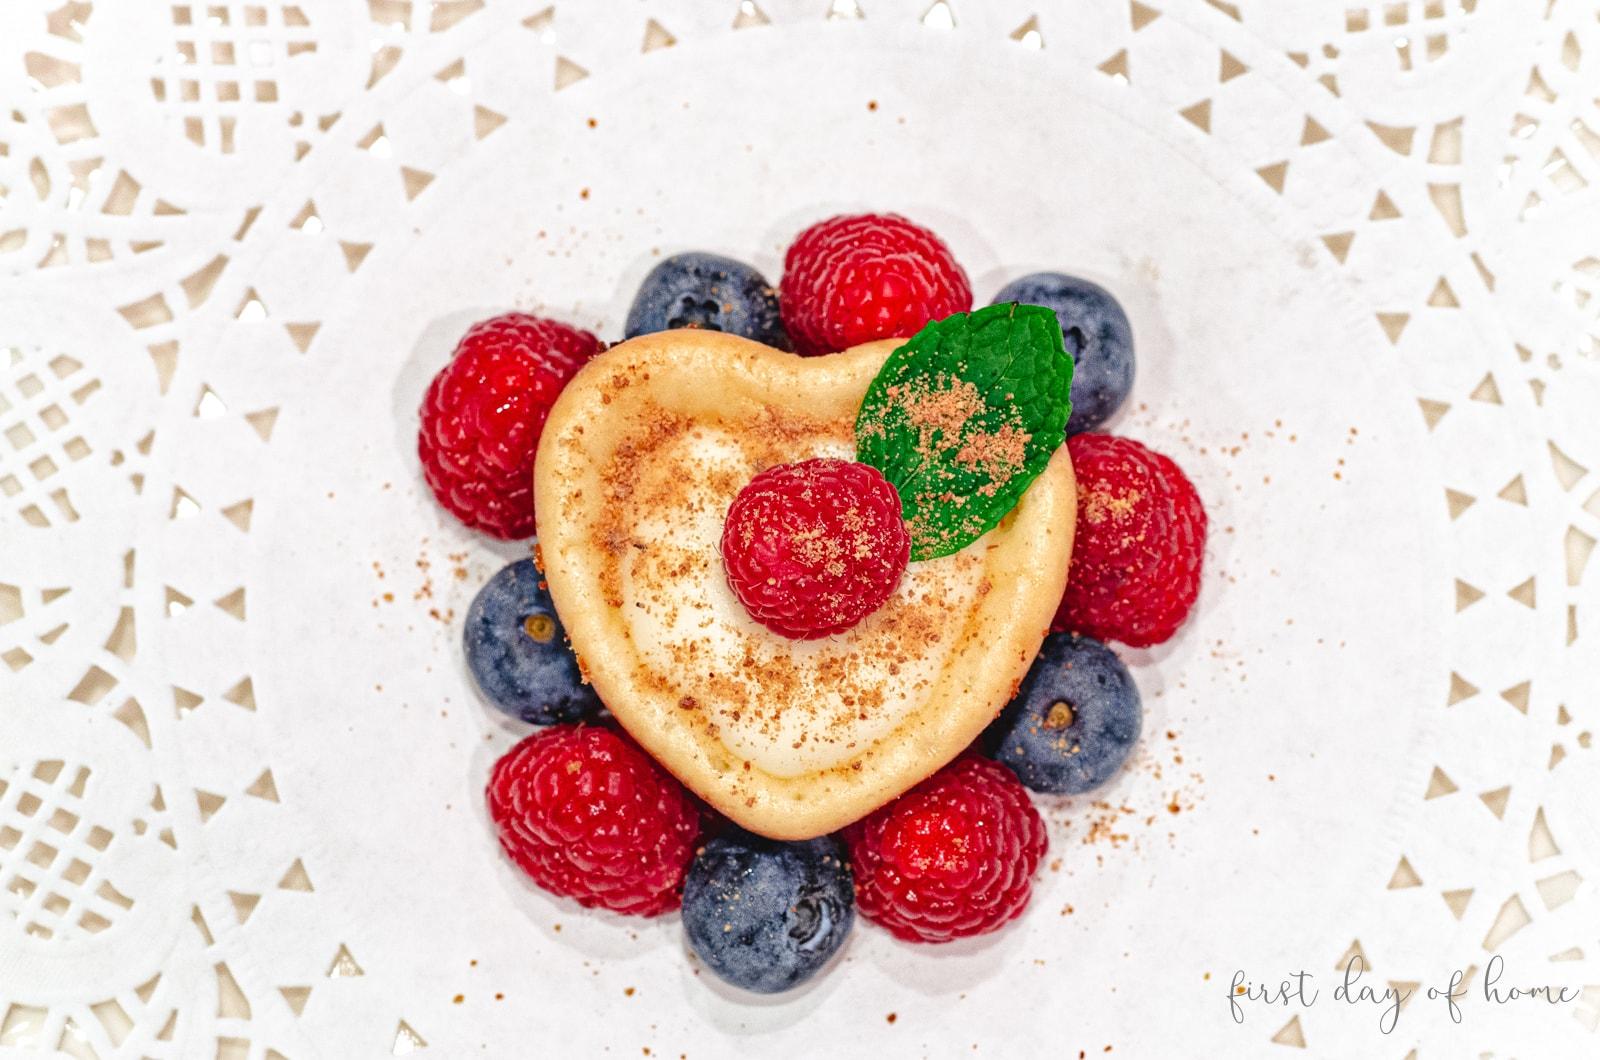 Heart shaped mini cheesecake with raspberries and blueberries